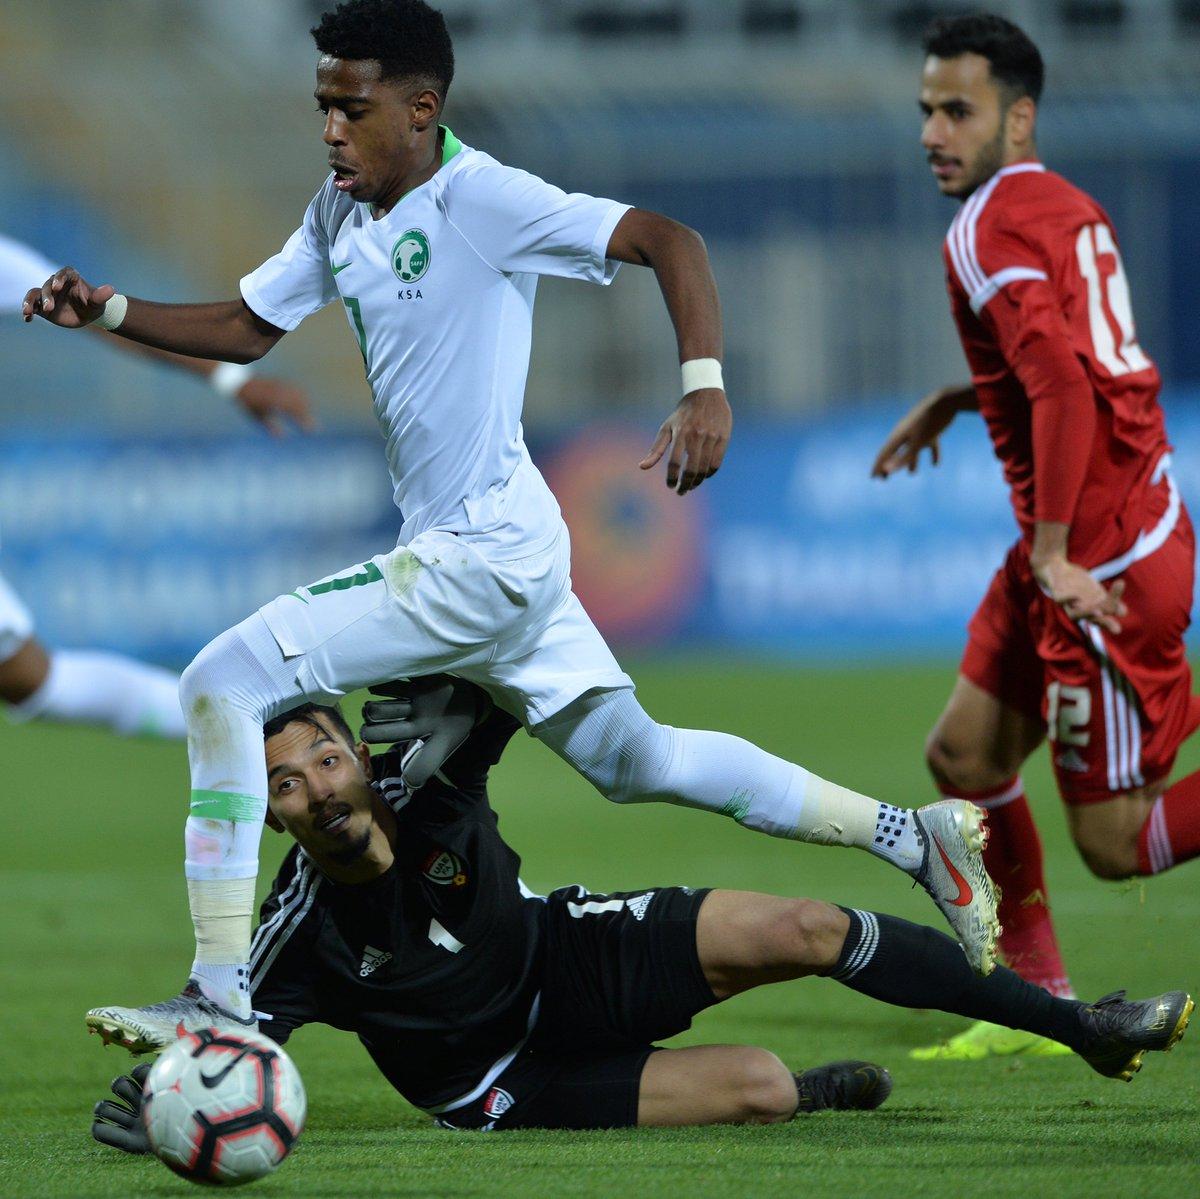 RT @SaudiNT: 📸 ـــ من المباراة 😍! #السعودية_الإمارات #معاك_يالأخضر https://t.co/vMNR3xDHWF